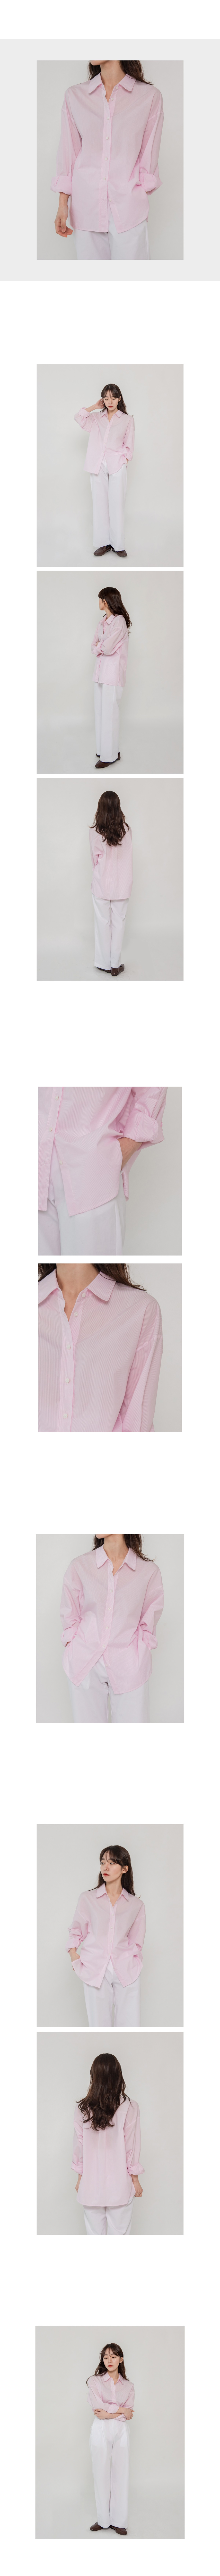 Sherbet striped shirt J